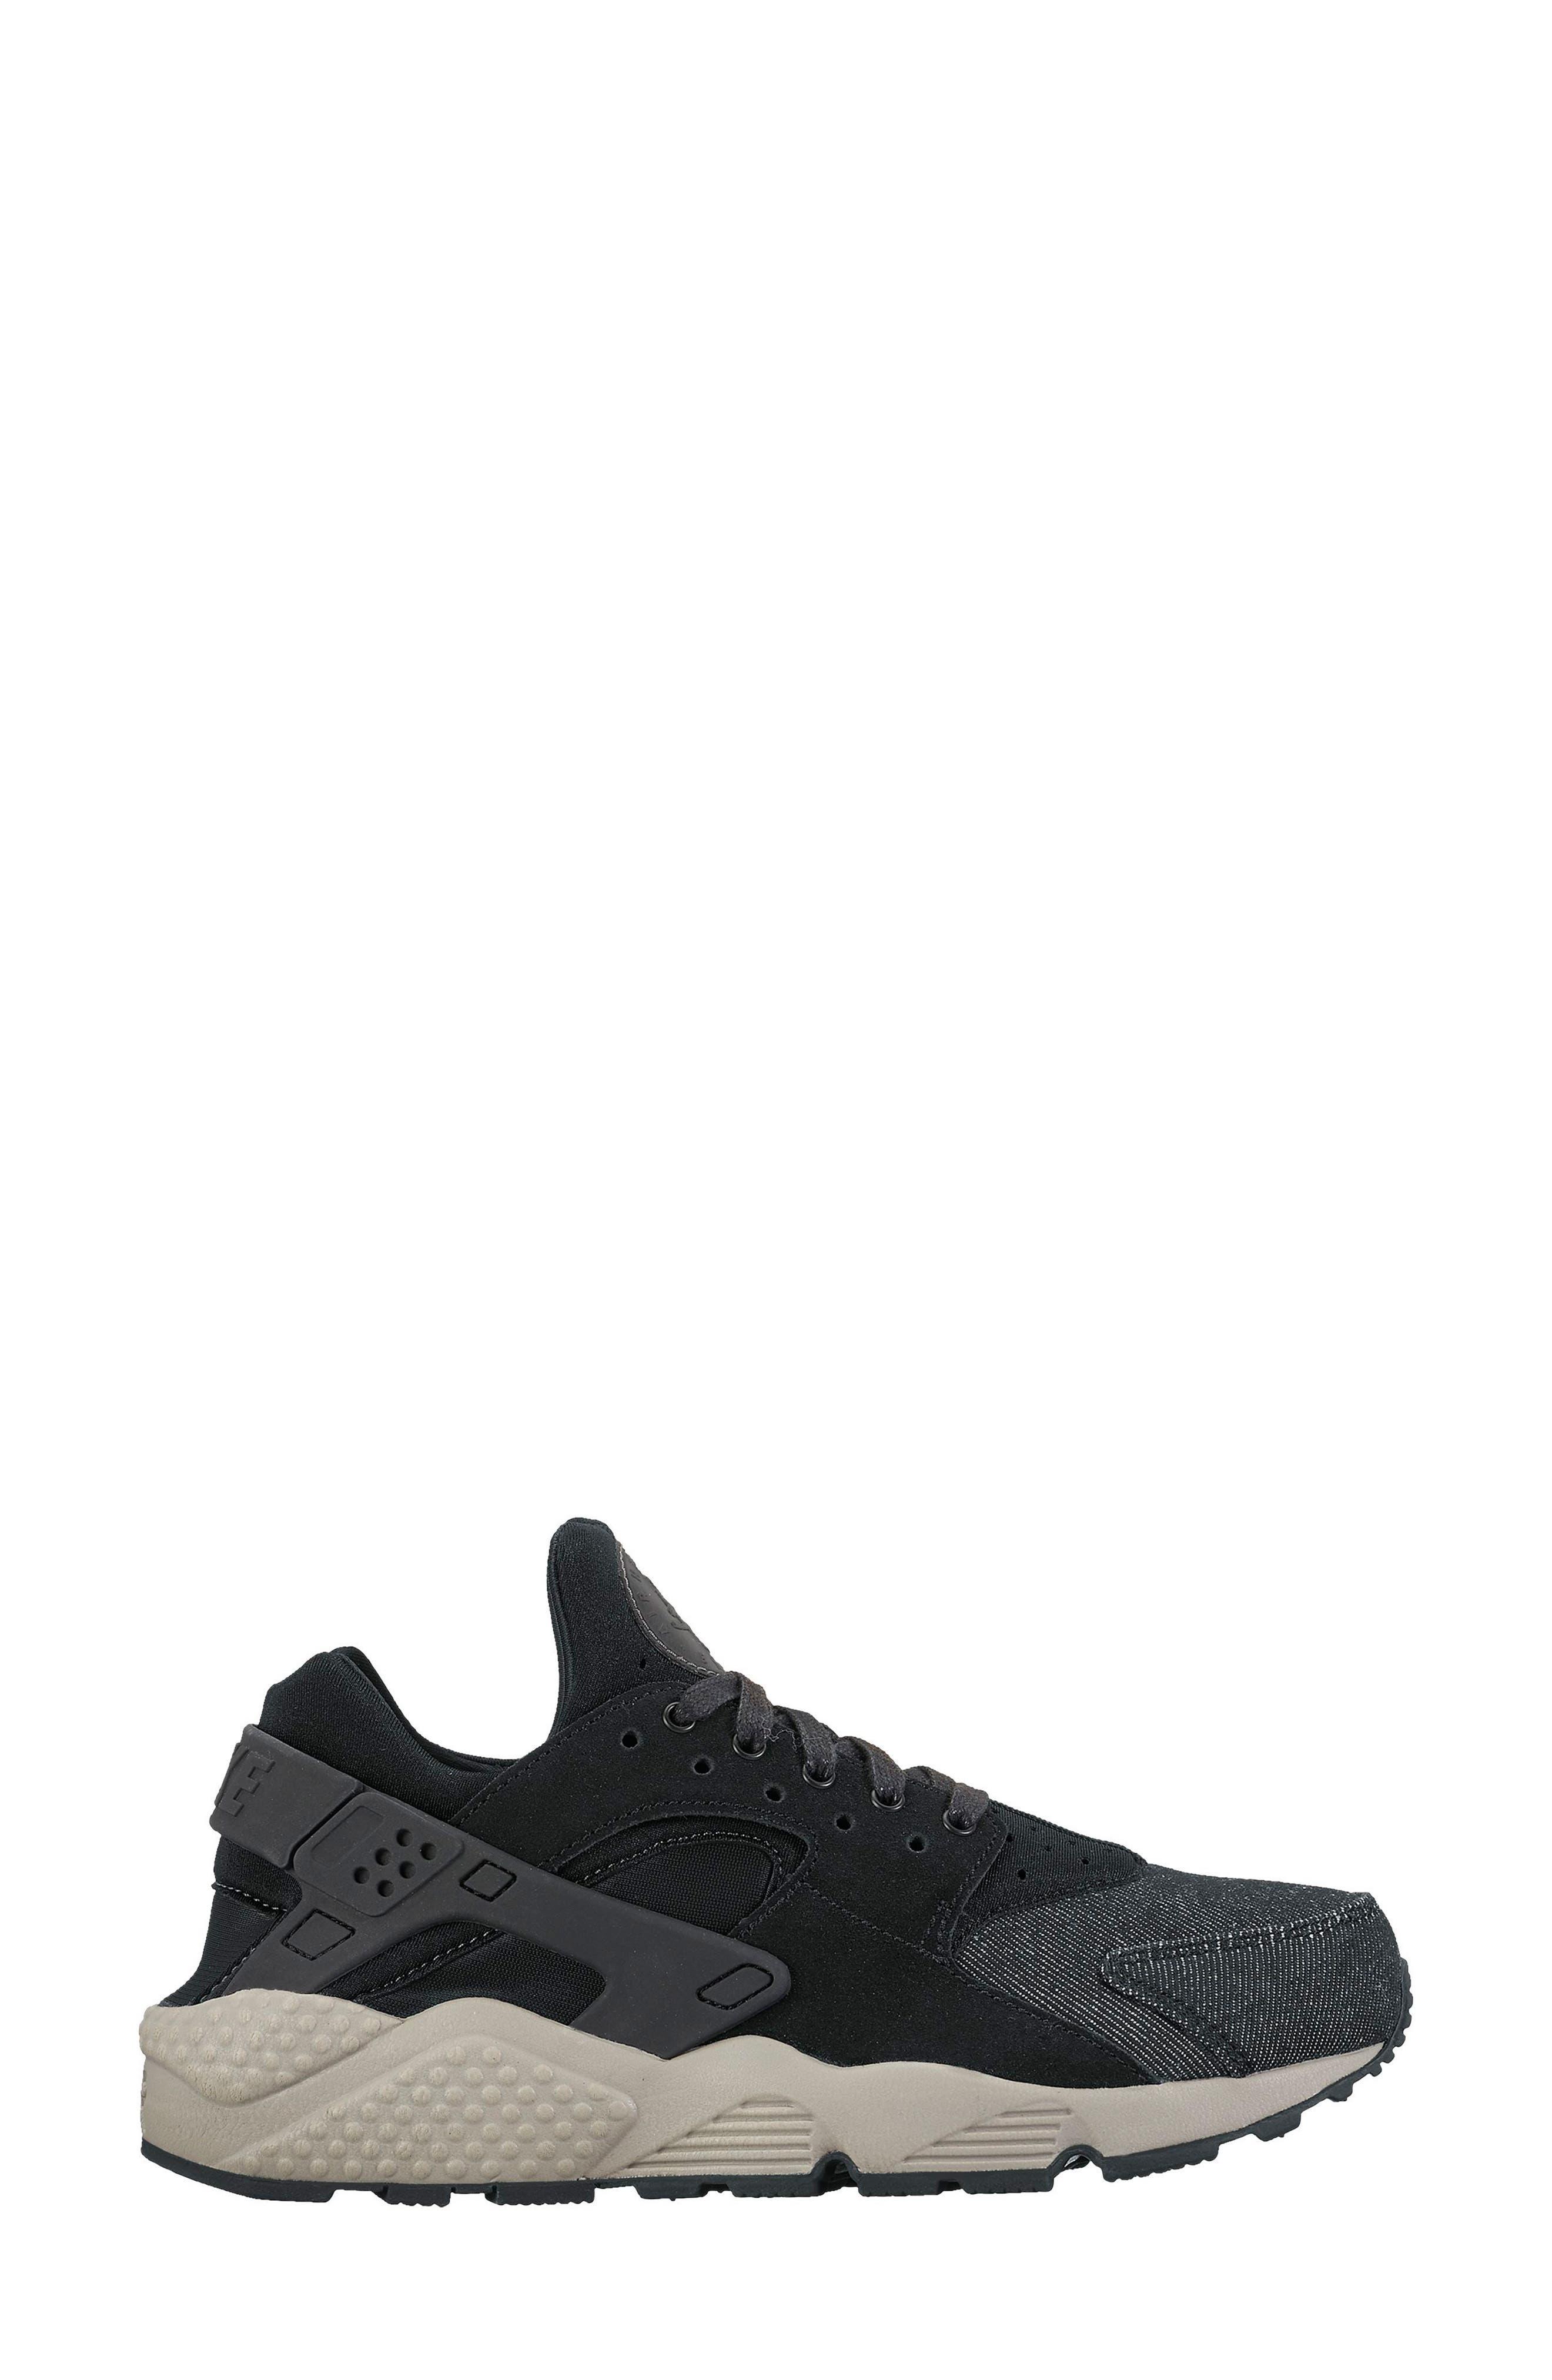 Air Huarache Run SE Sneaker,                             Main thumbnail 1, color,                             Black/ Dark Grey/ Cobblestone